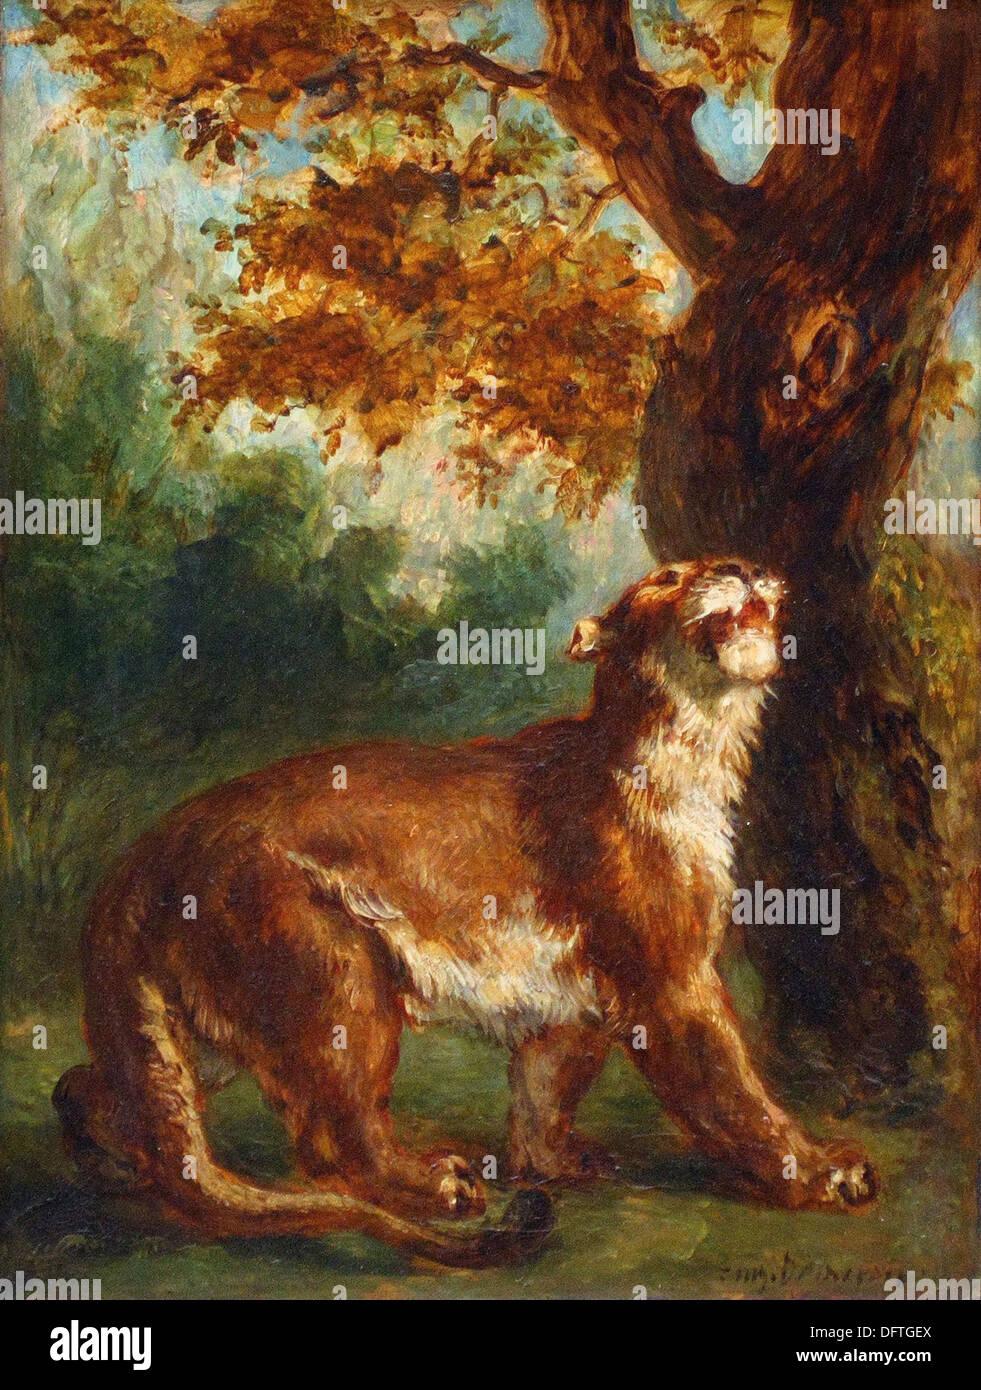 Eugène DELACROIX - Le puma - 1859 - Orsay Museum - Paris - Stock Image